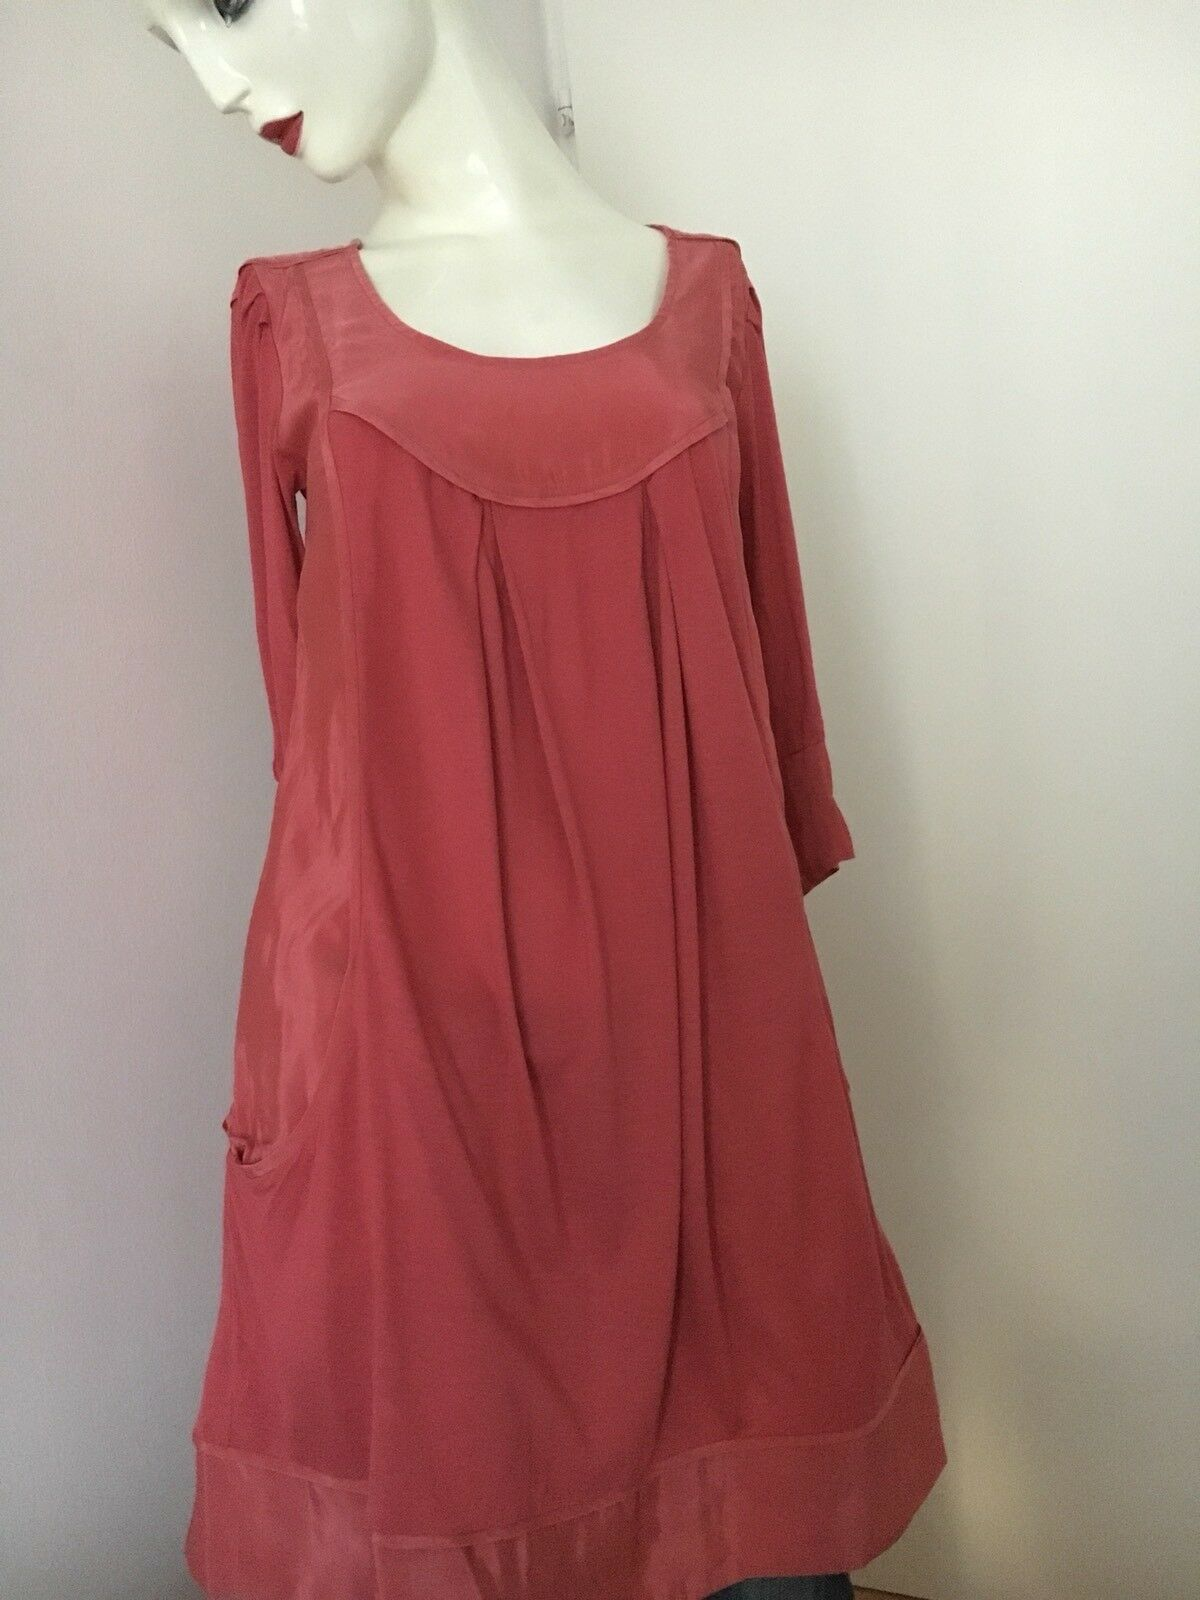 Top Shirt Kleid Tunika Kleid COMPTOIR DES COTONNIERS Gibraltar rot S 34 36